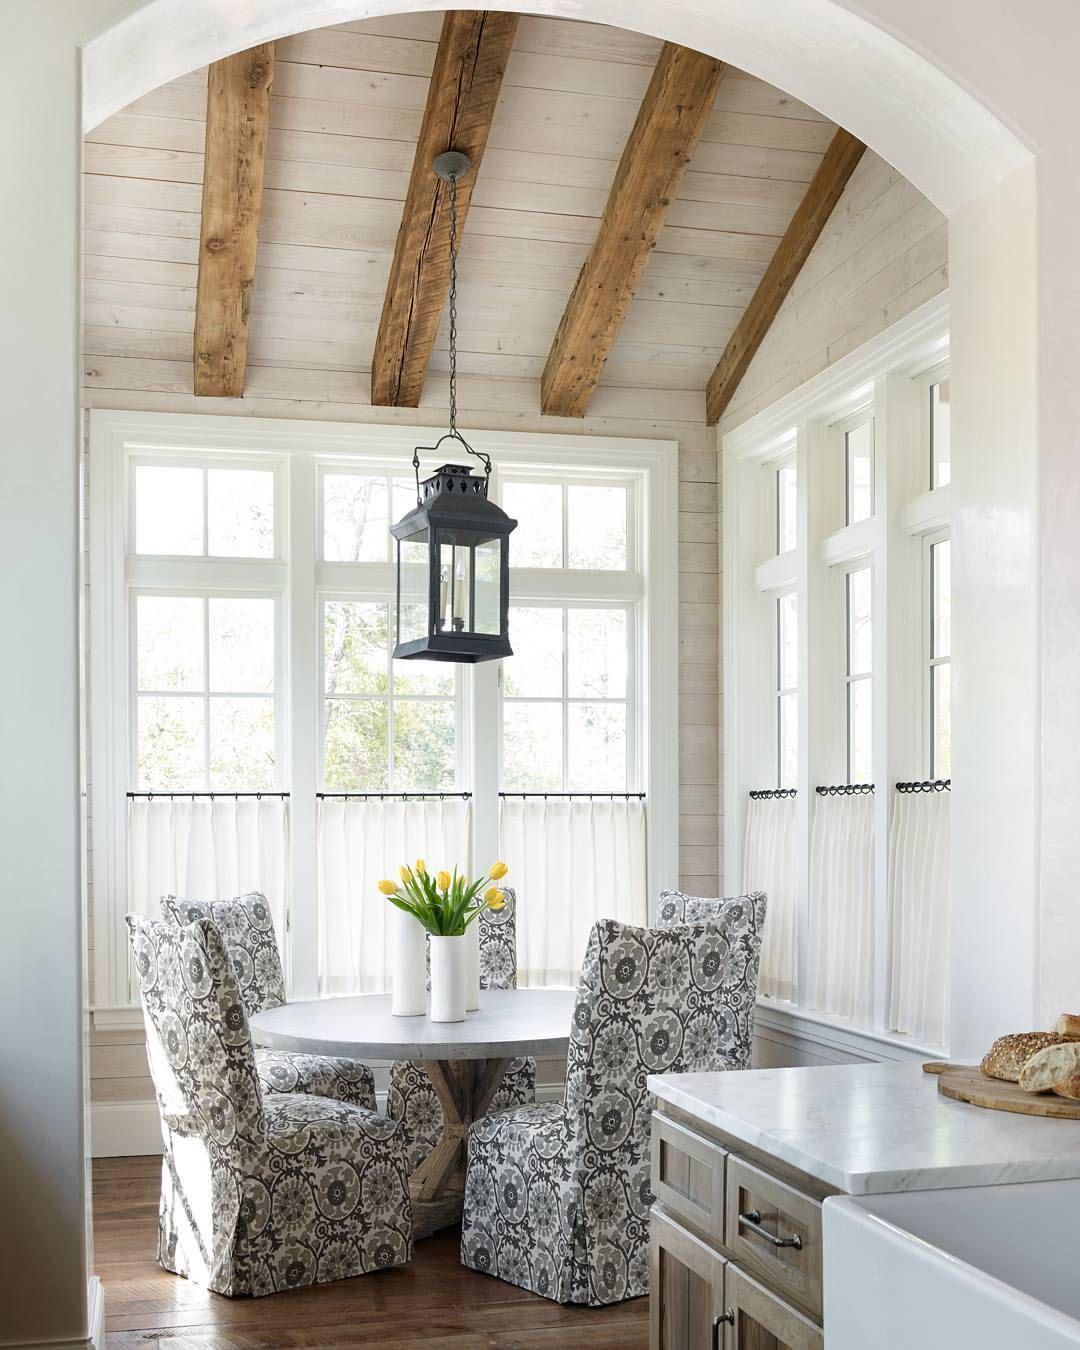 Pin de Kim Leatherman Halvorson en Dining Rooms | Pinterest | Salas ...